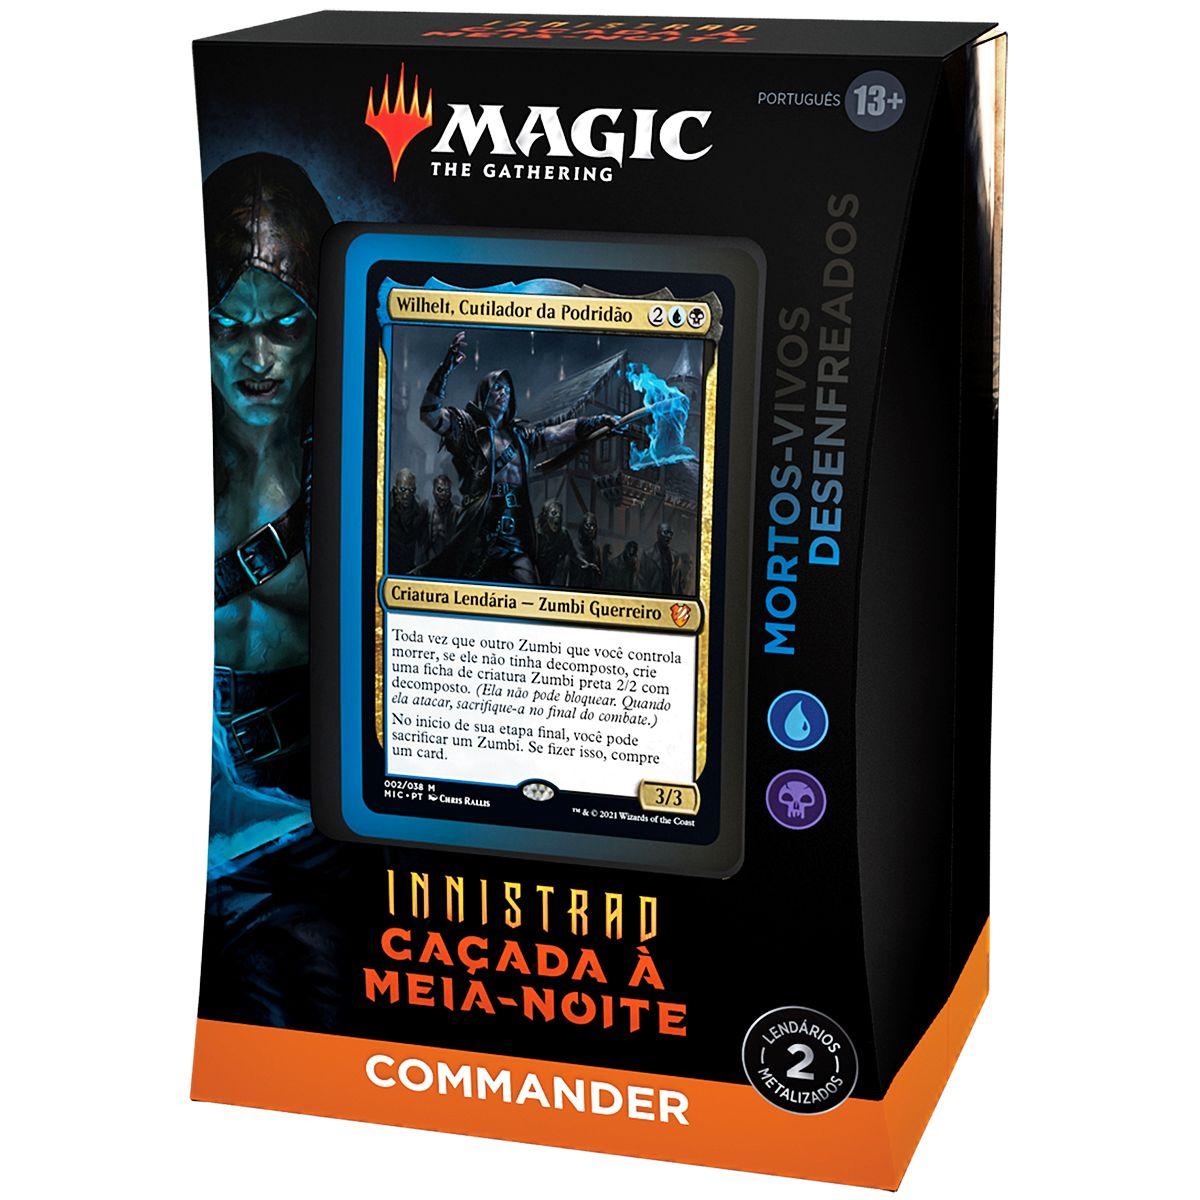 Magic Deck Commander Innistrad Caçada A Meia-Noite Wilhelt